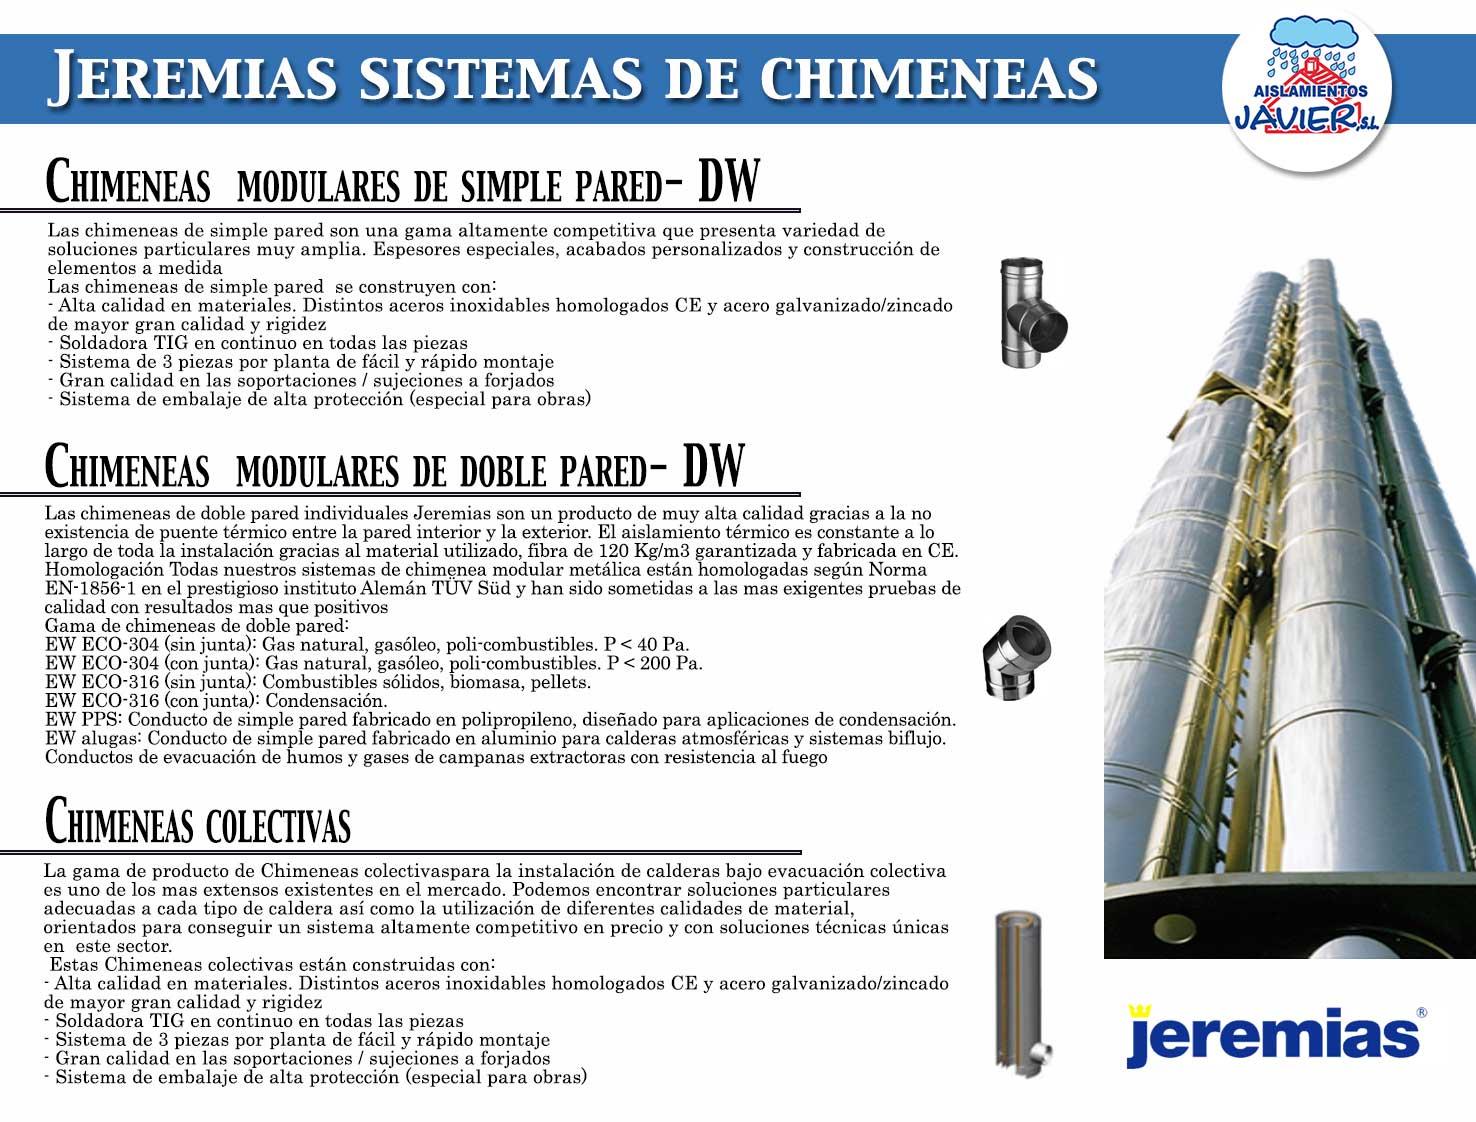 Chimeneas-Jeremias